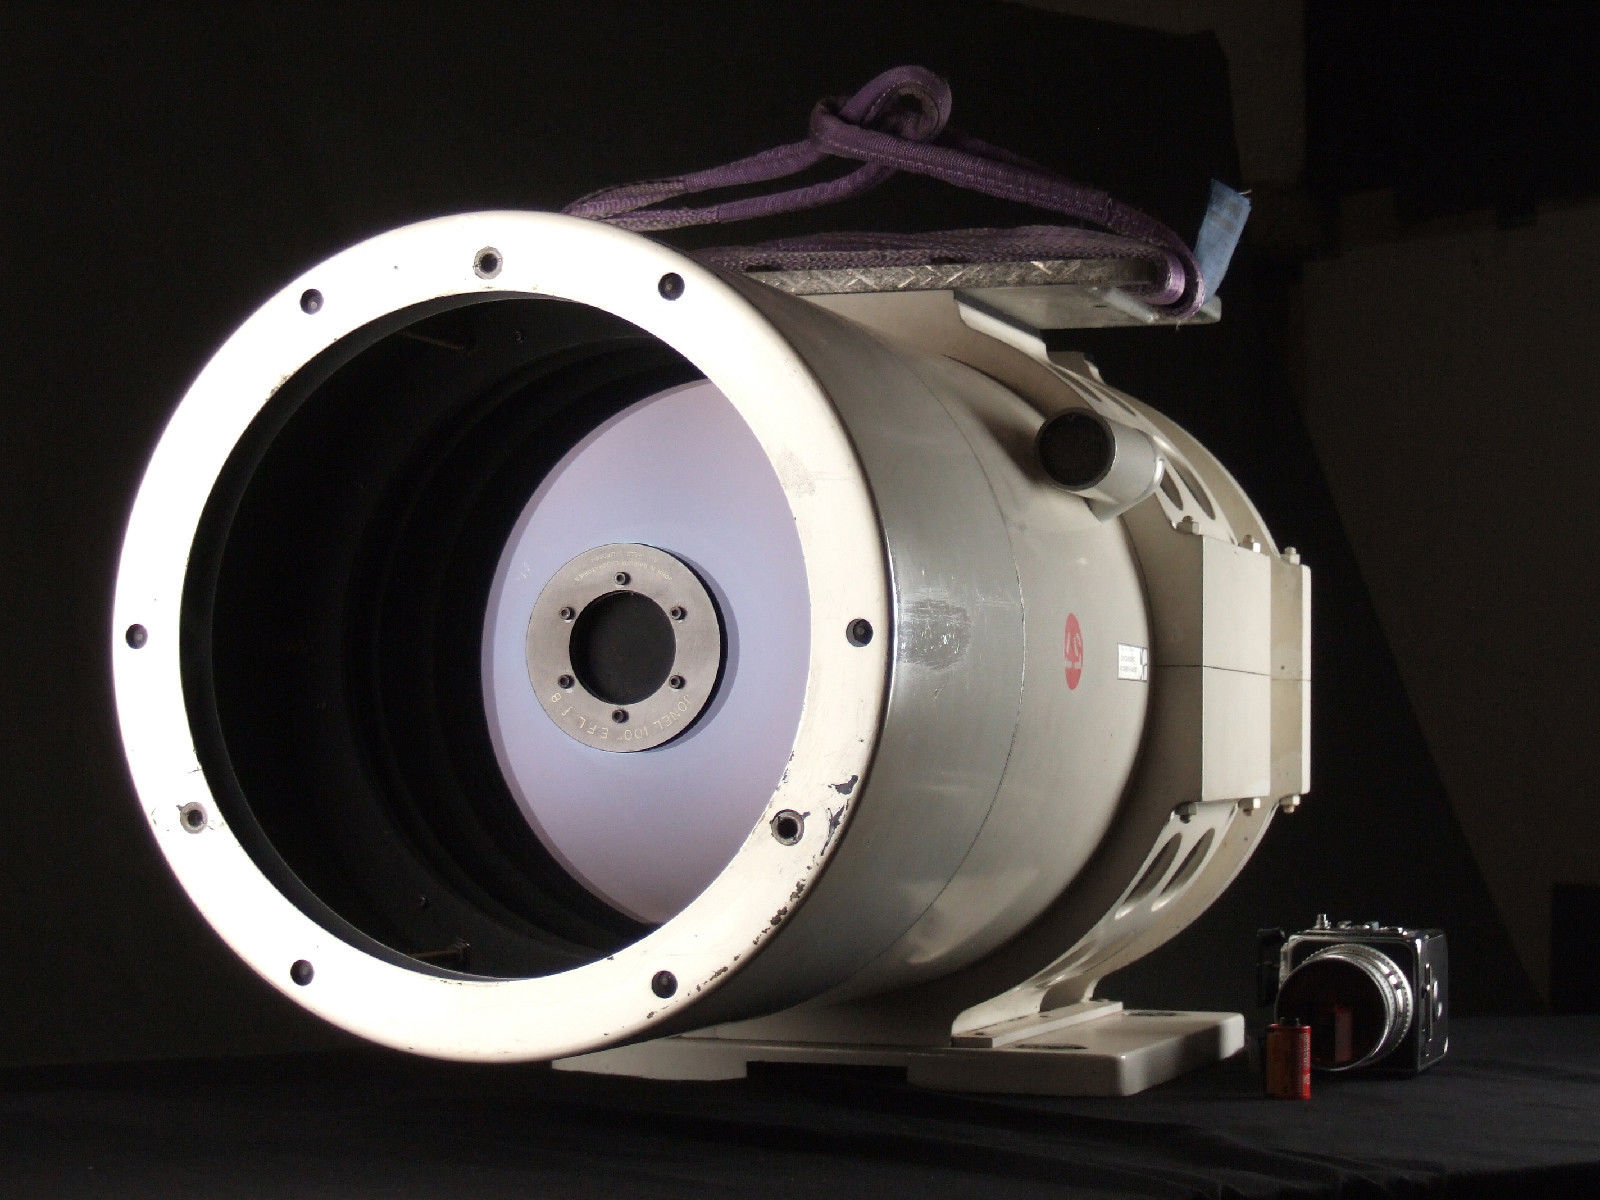 Massive $33,500 2450mm f/8 NASA lens surfaces on eBay